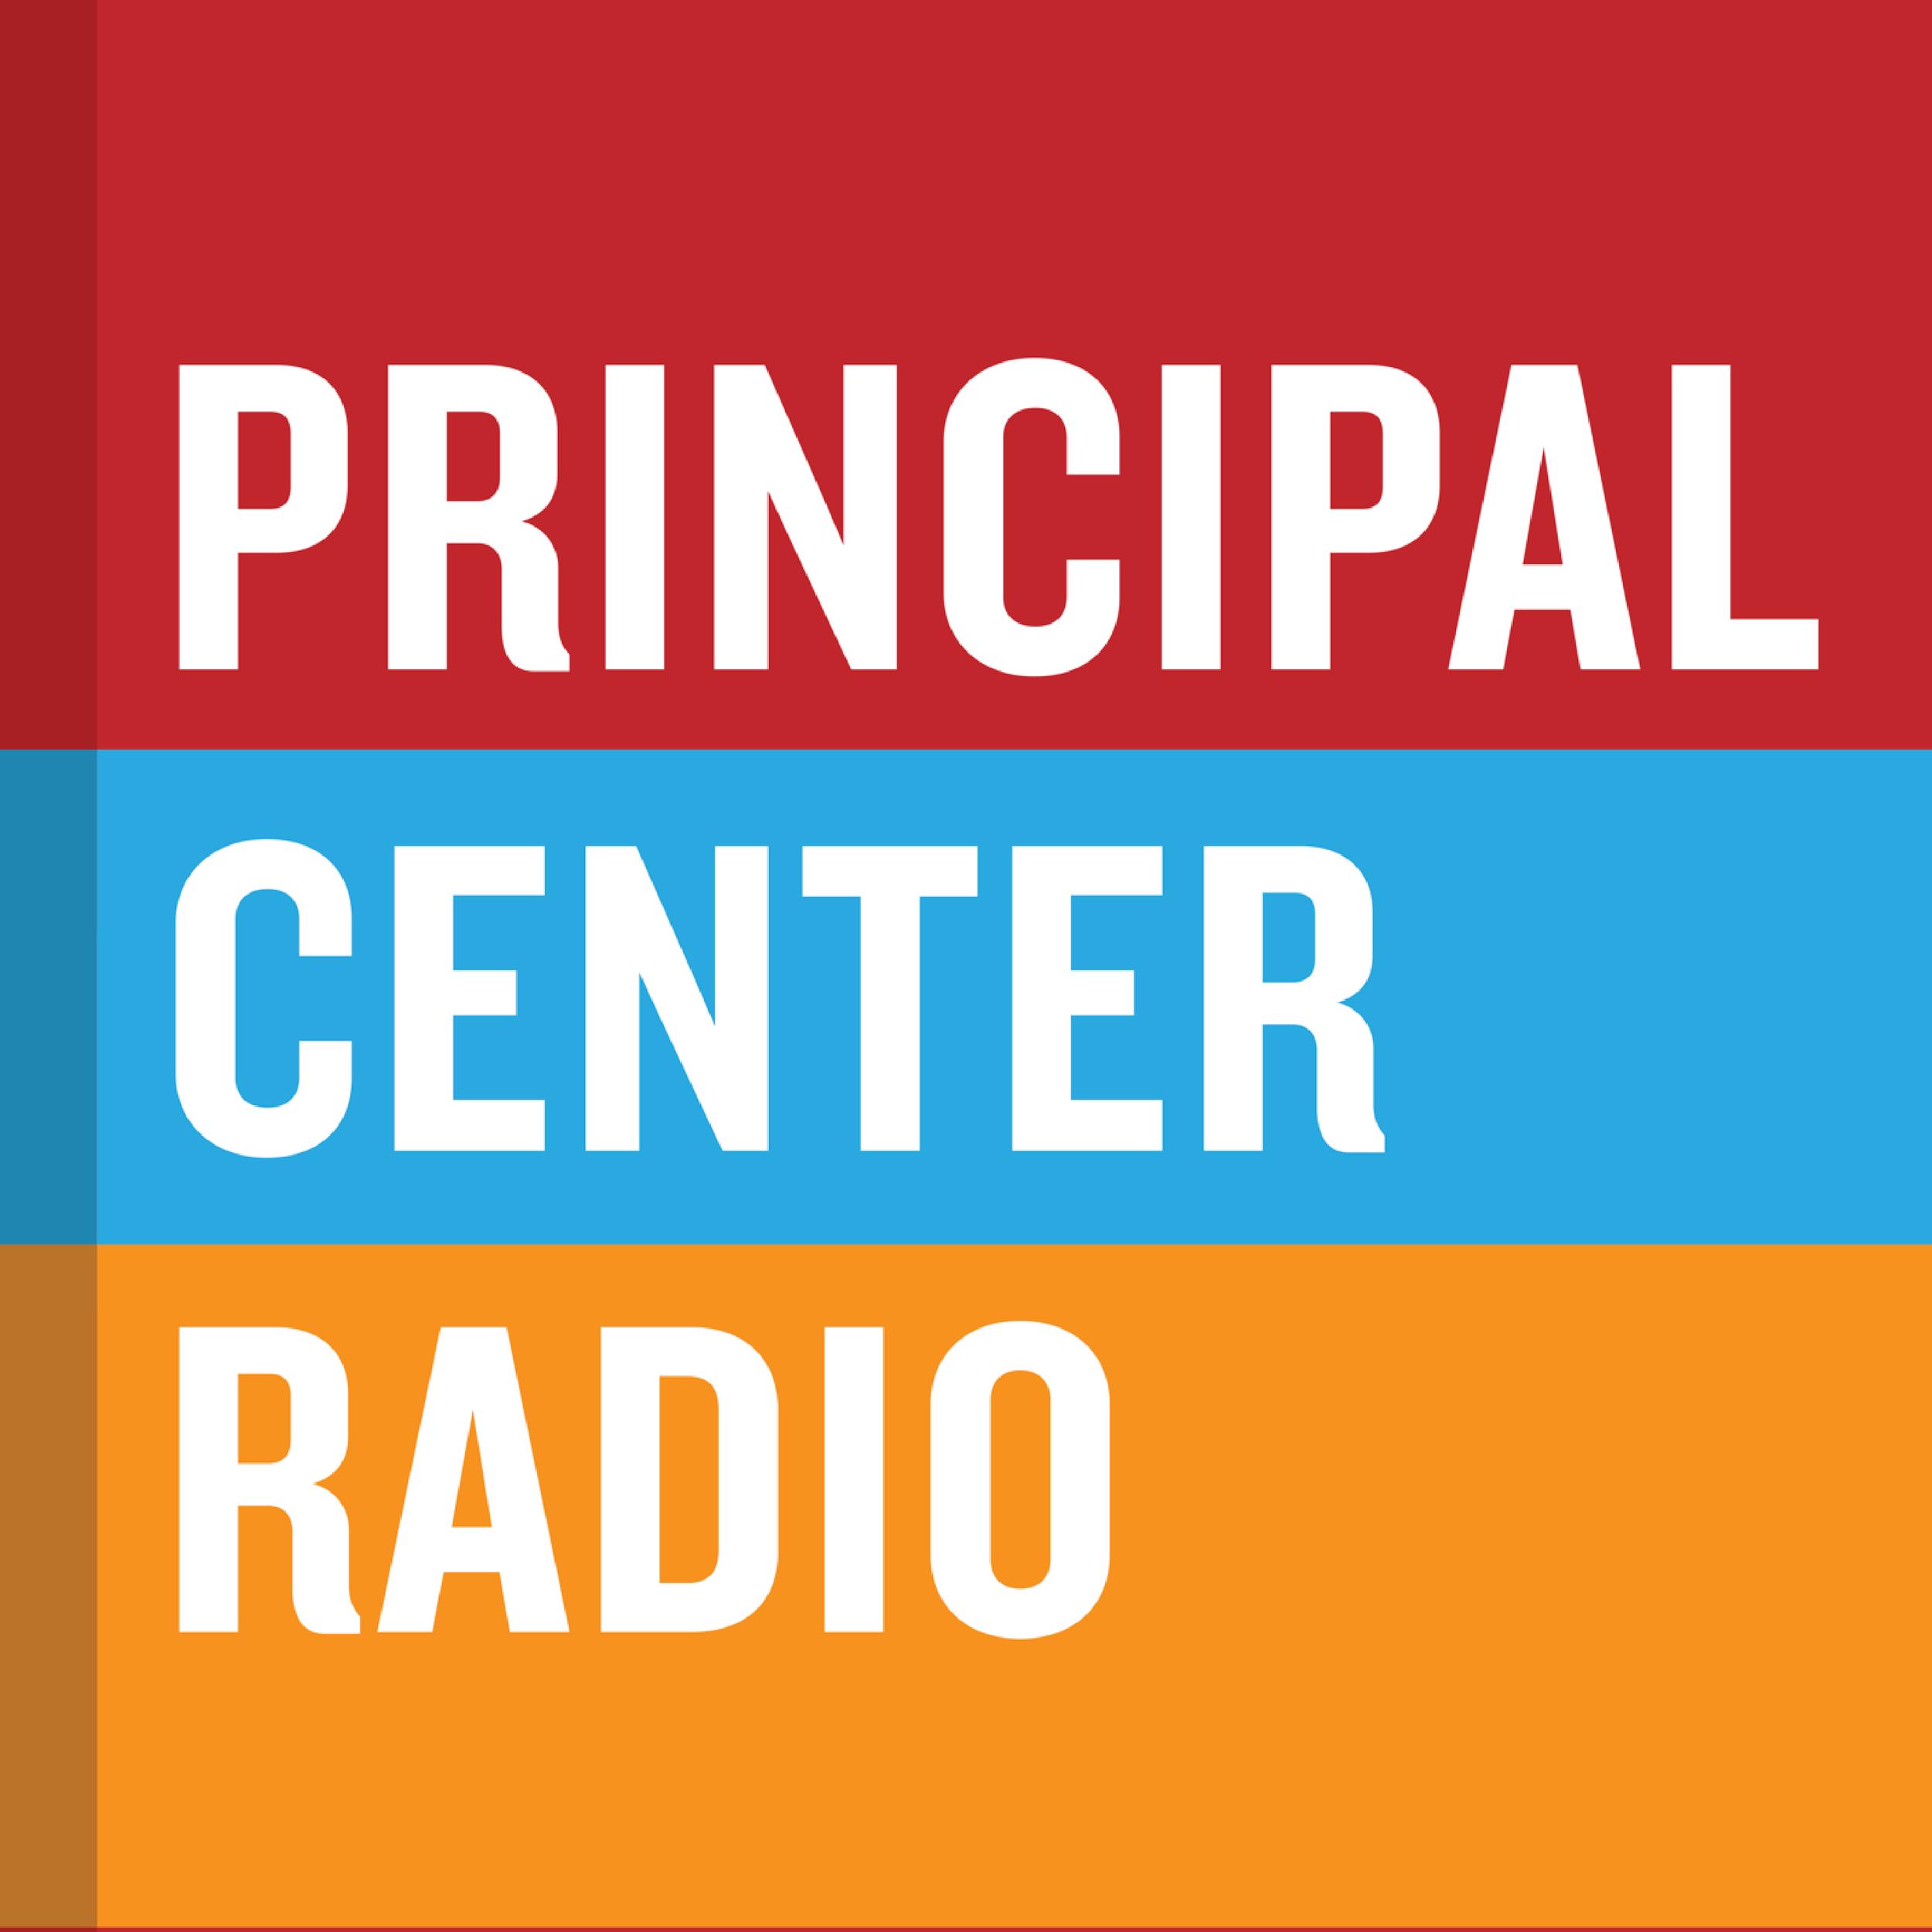 Principal_Center_Radio.png